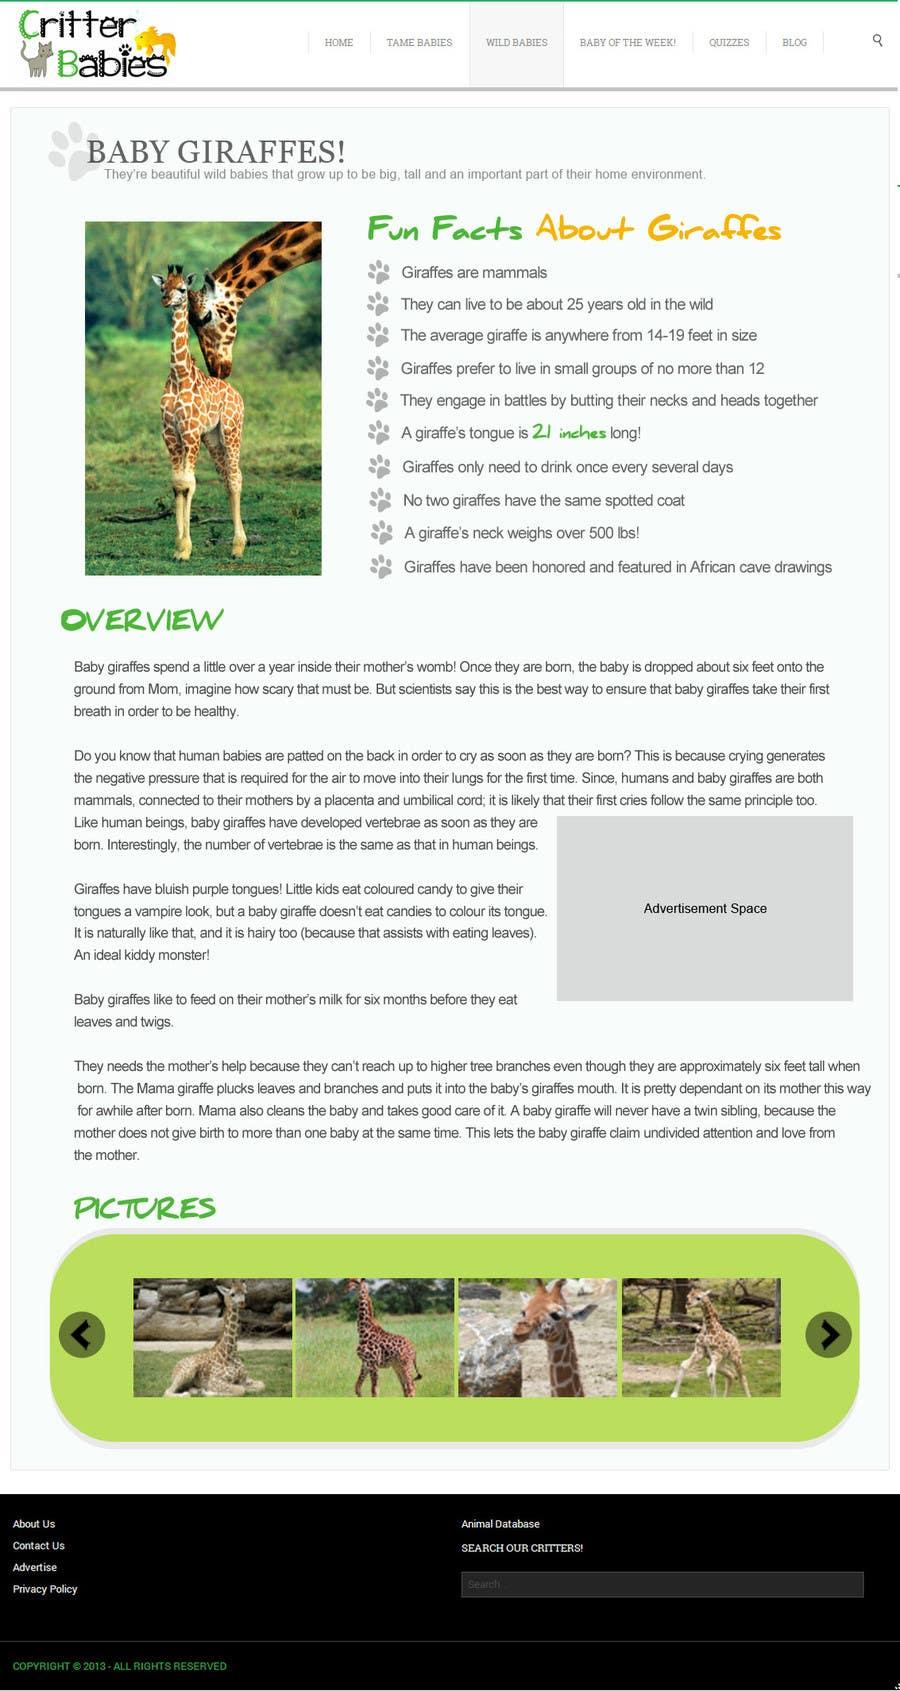 Proposition n°1 du concours Design a Website Mockup